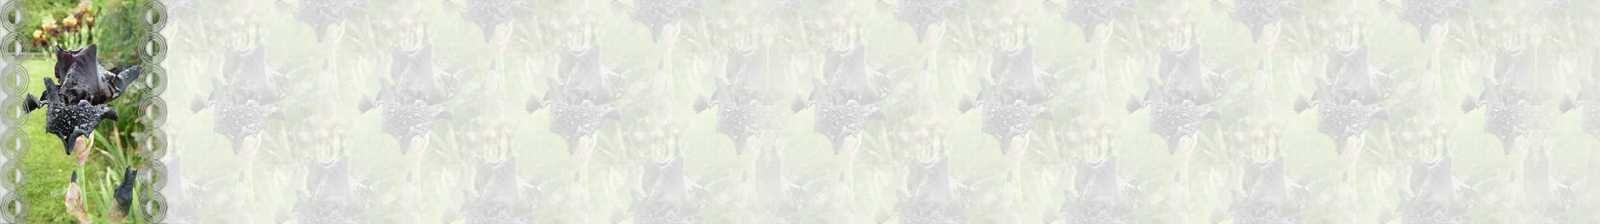 Iris before the storm Incredimail &amp&#x3B; Papier A4 h l &amp&#x3B; outlook &amp&#x3B; enveloppe &amp&#x3B; 2 cartes A5 &amp&#x3B; signets 3 langues   fleur_iris_beforethestorm_dscn1418_00